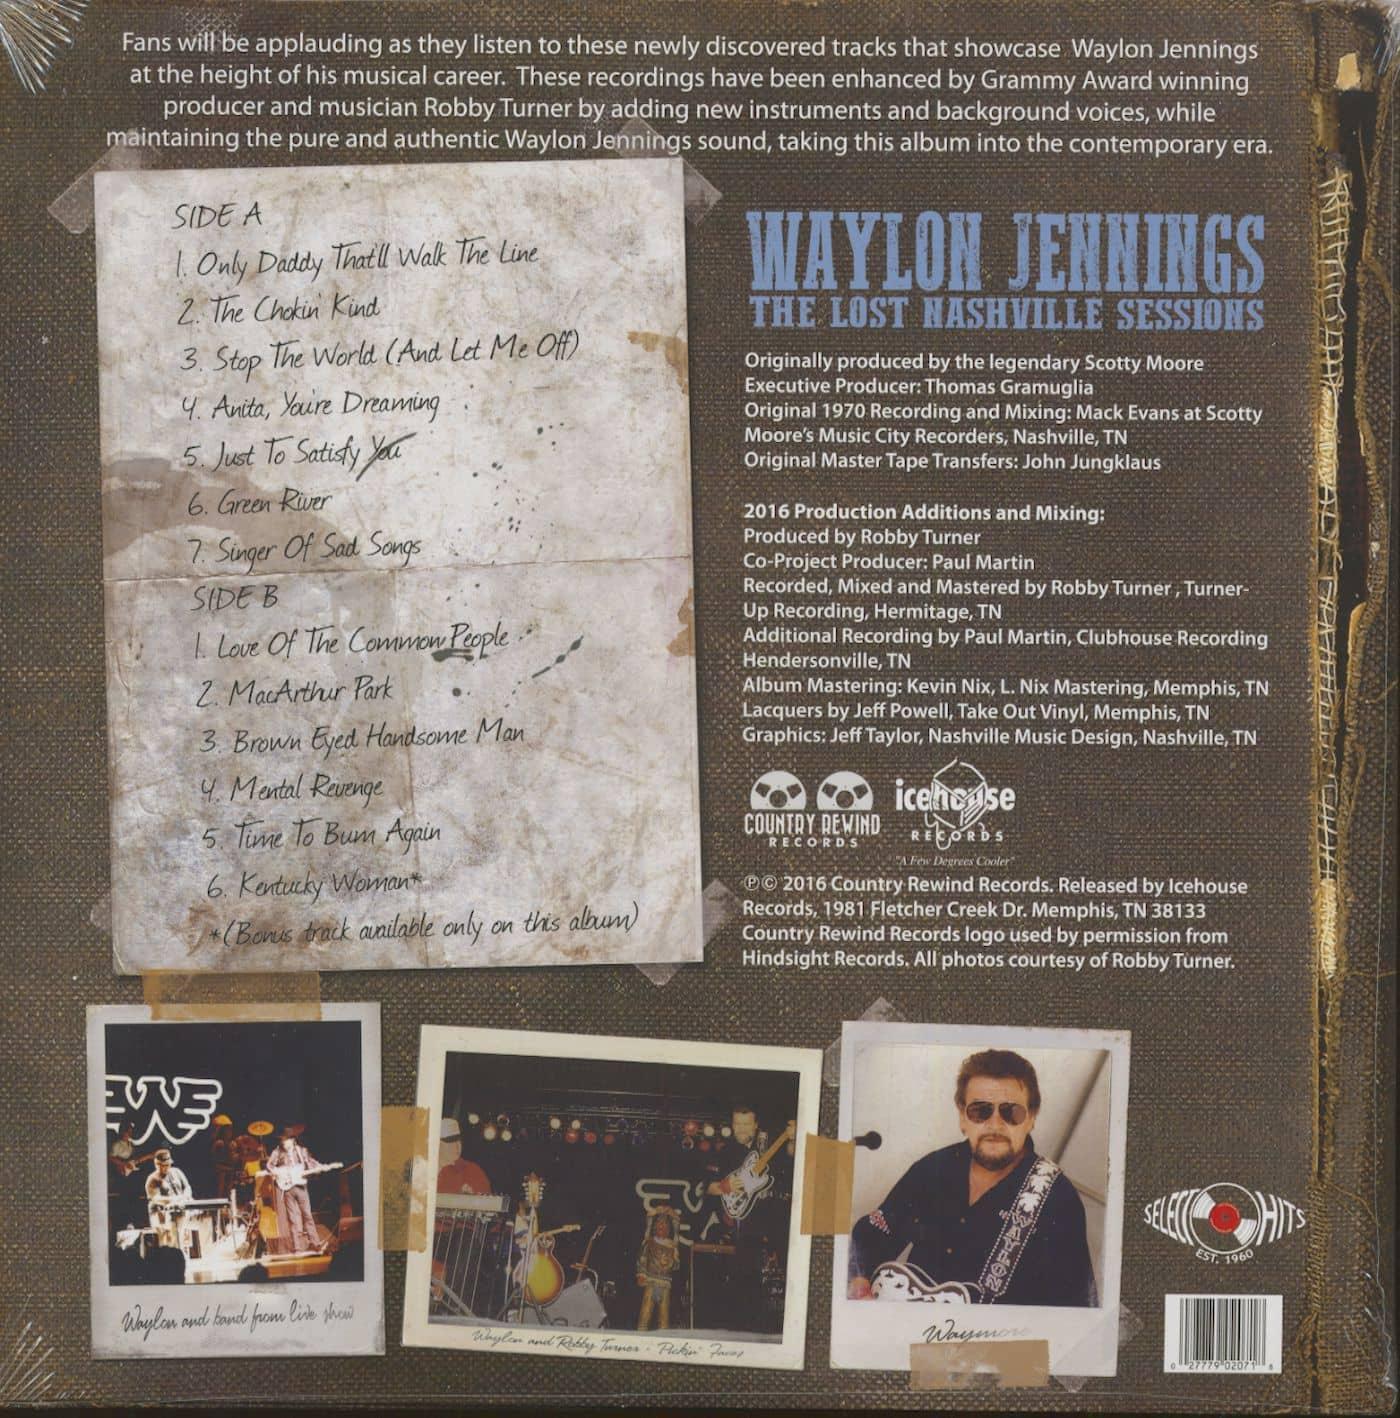 Preview The Lost Nashville Sessions Lp 180g Vinyl